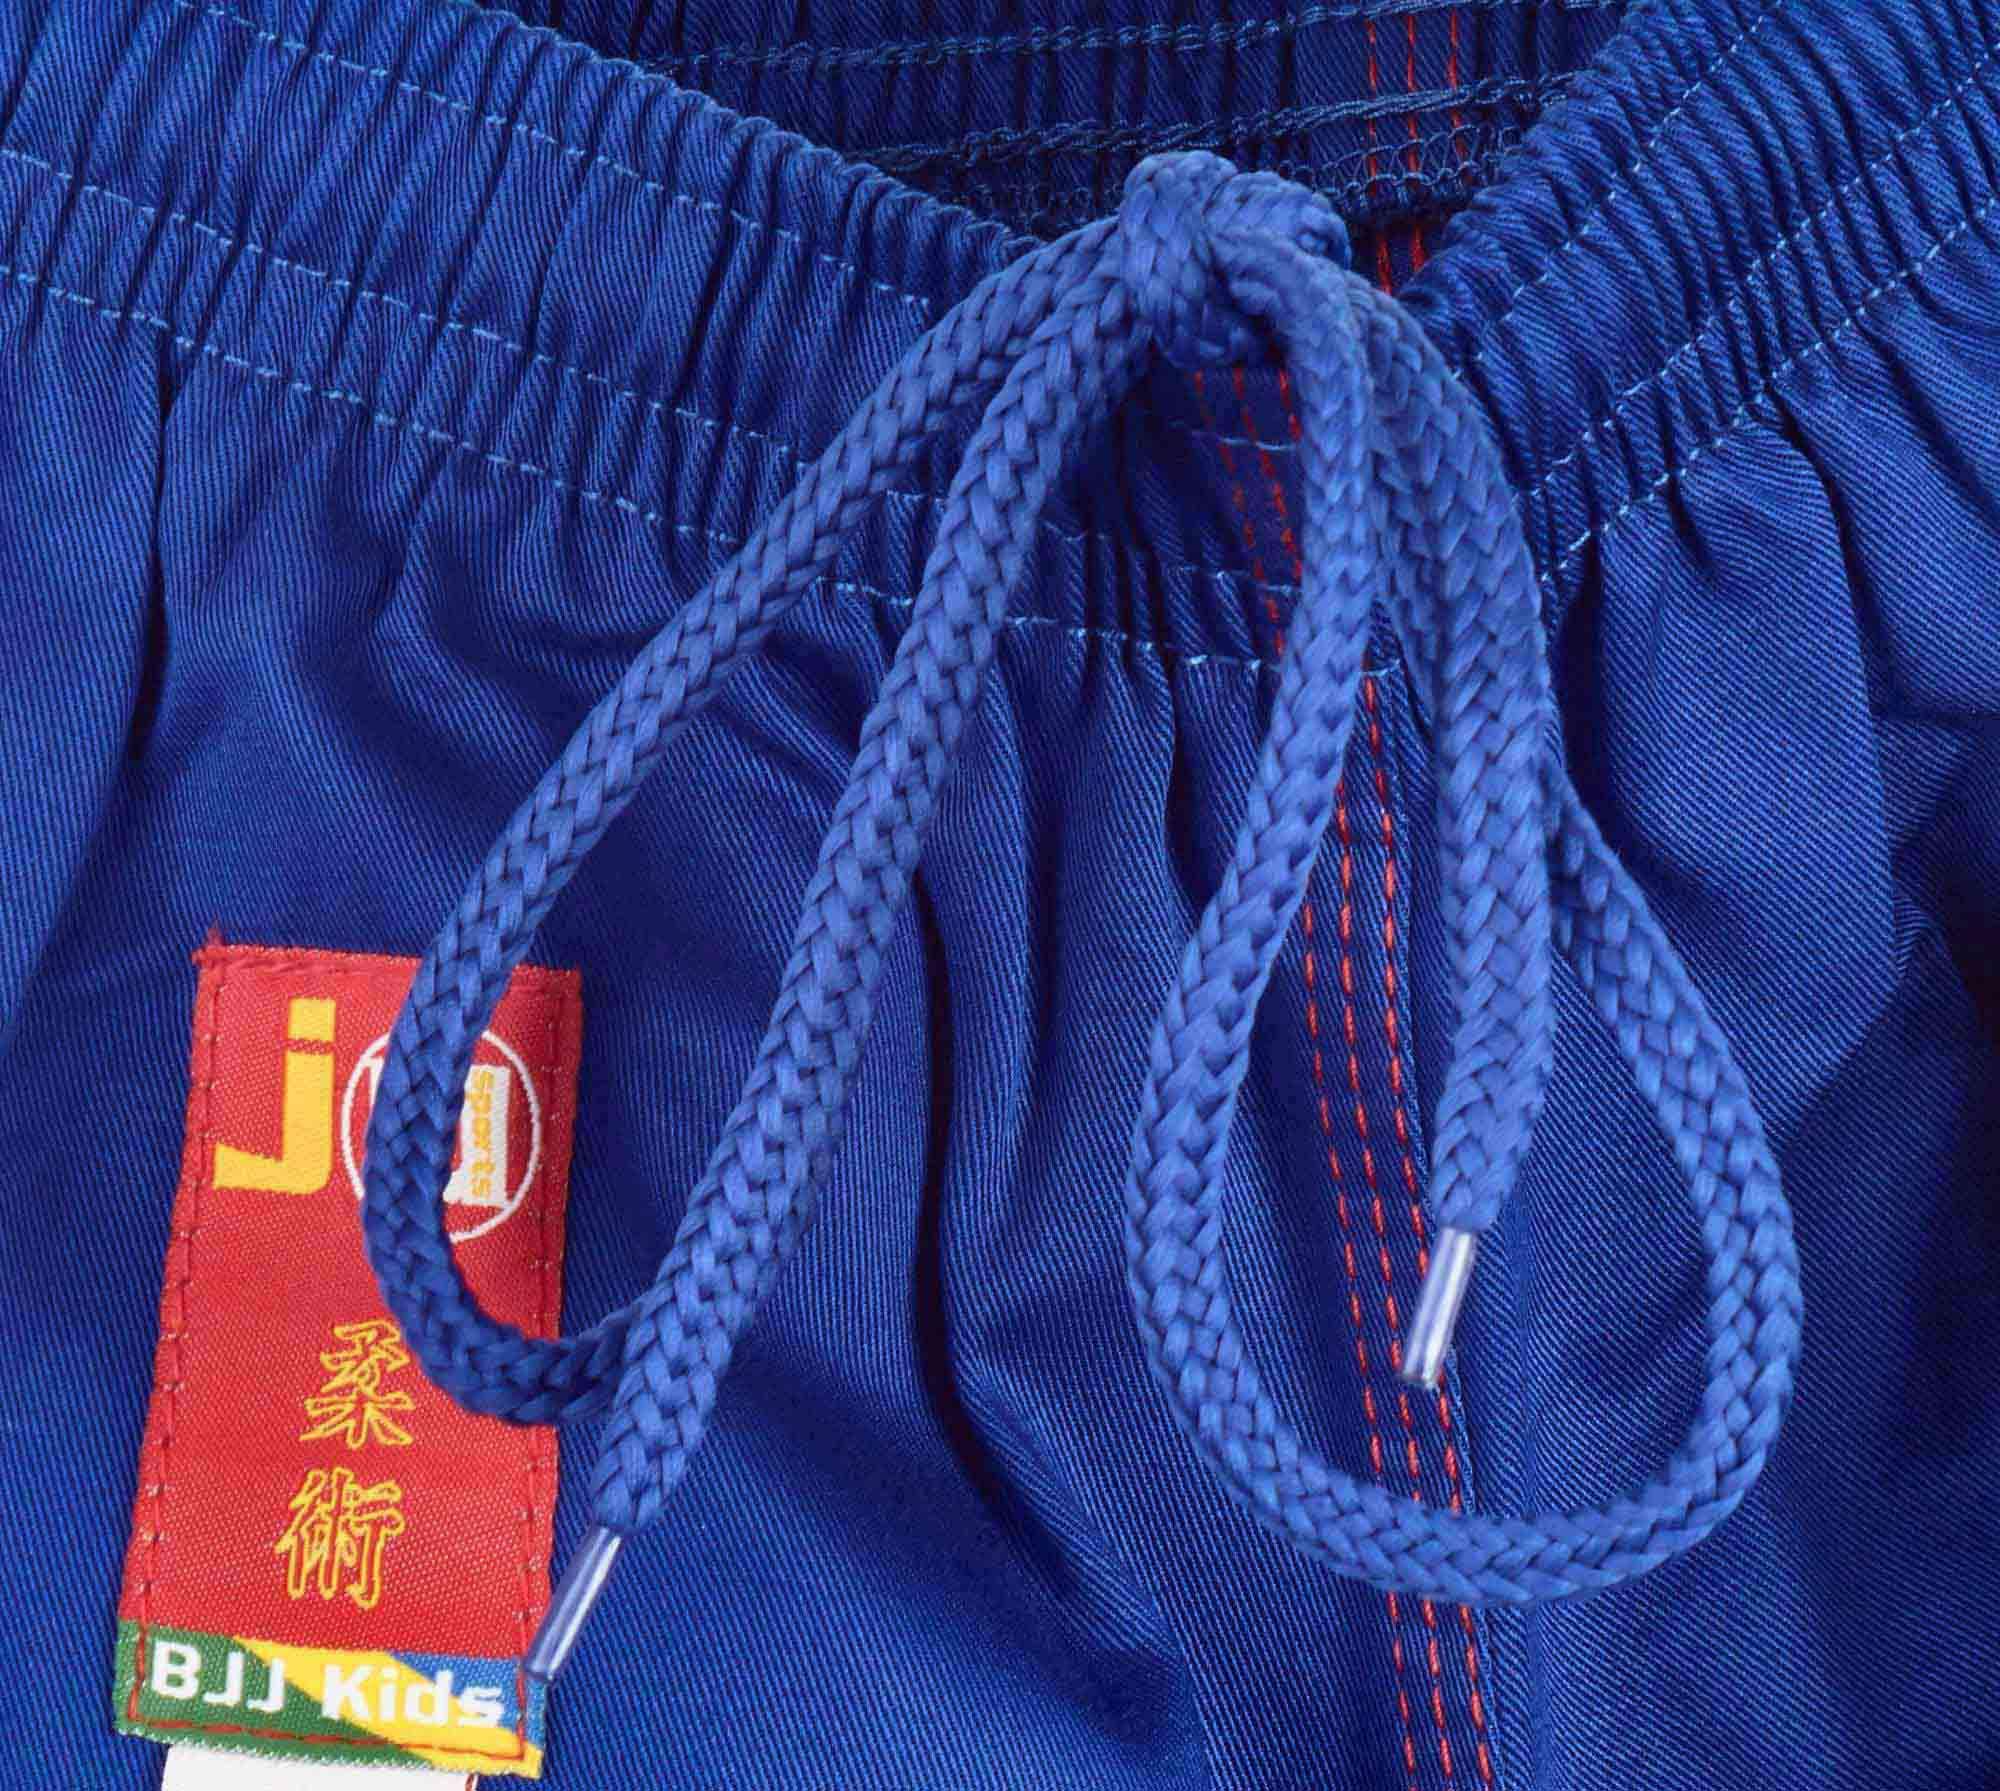 9247000-BJJ-Gi-Kids-blau-d5